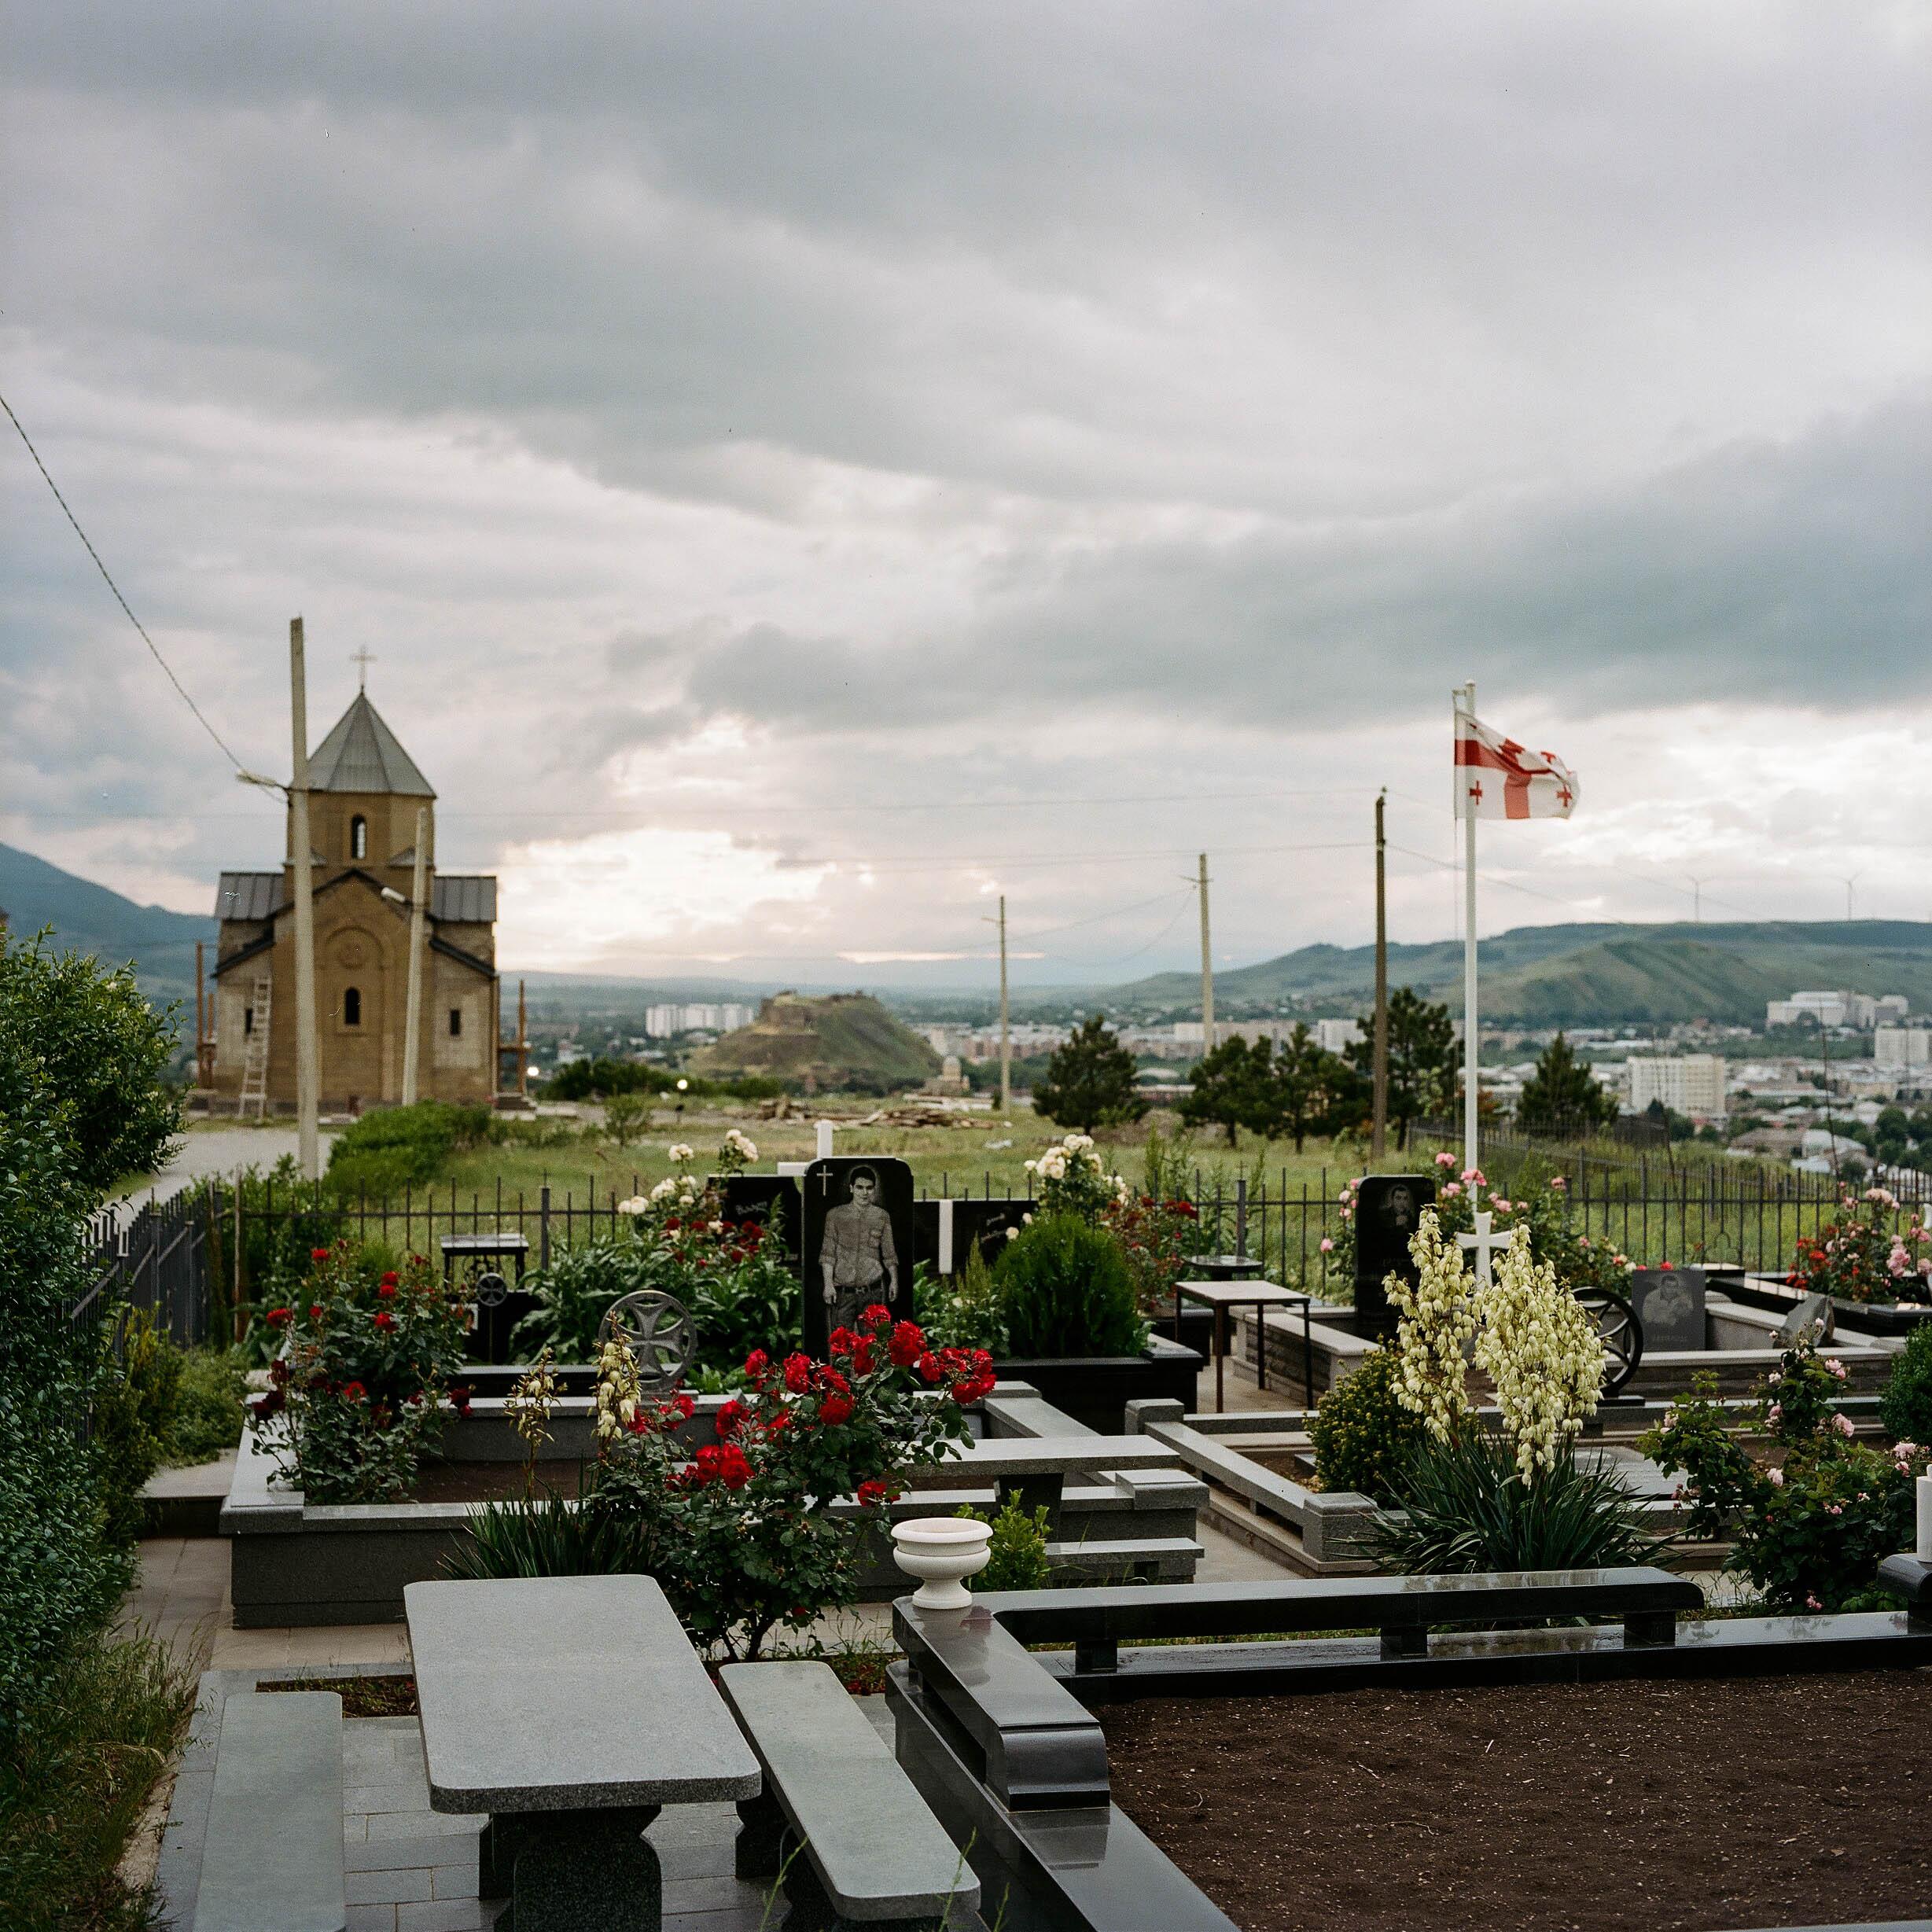 A church on the hills surrounding Gori, Georgia.